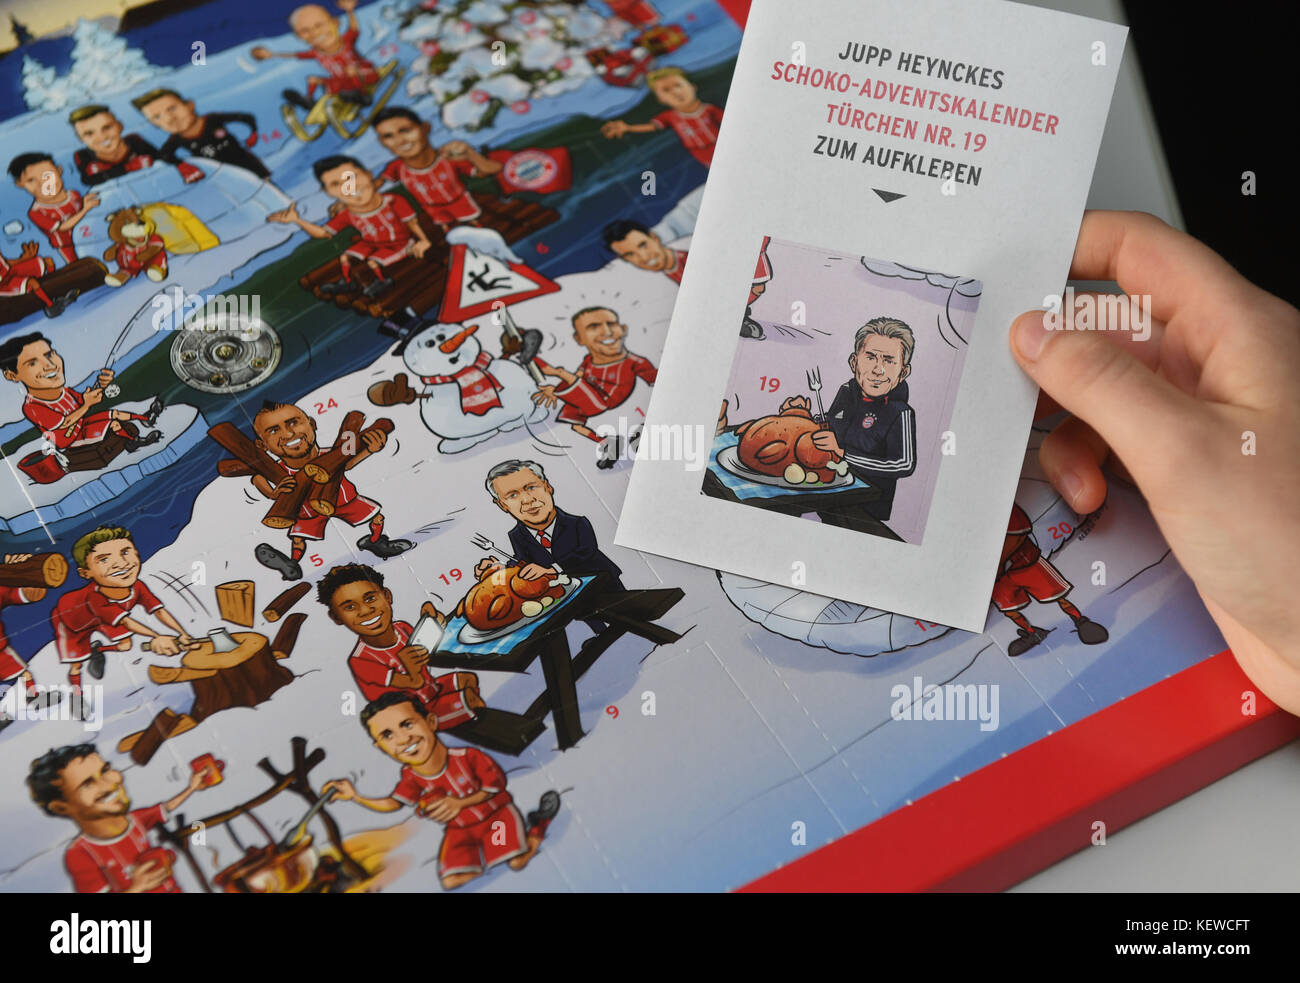 Fc Bayern Weihnachtskalender.Illustration An Fc Bayern Munich Advent Calandar Featuring The